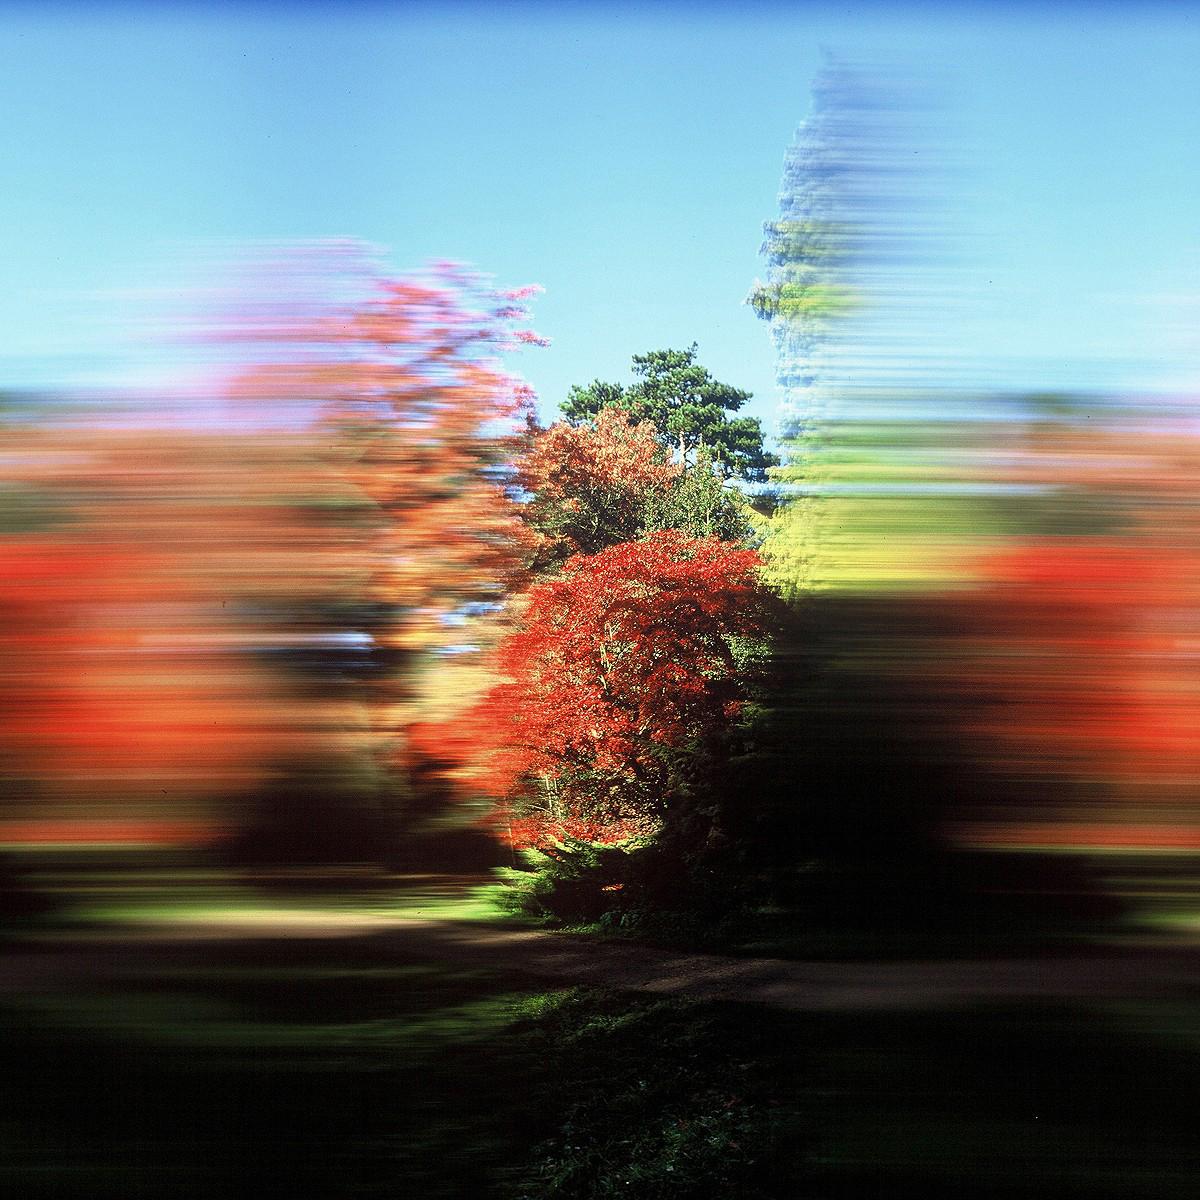 Rob Carter - Travelling Still, Westonbirt Arboretum I, England